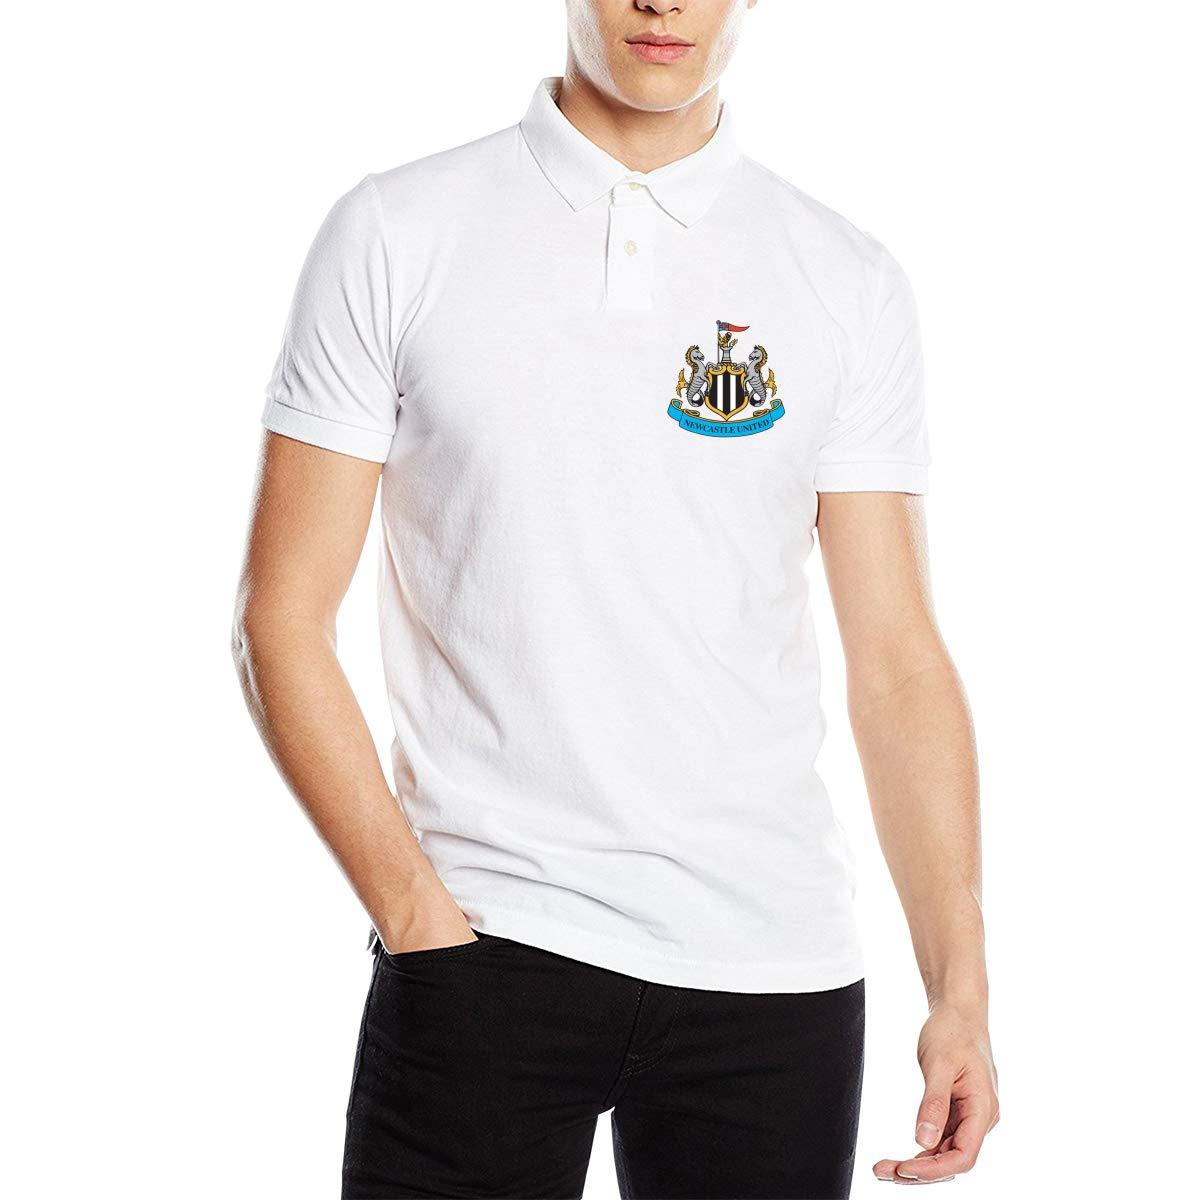 Cute Shop Newcastle United Mens Premium Polo Shirt Unofficial ...